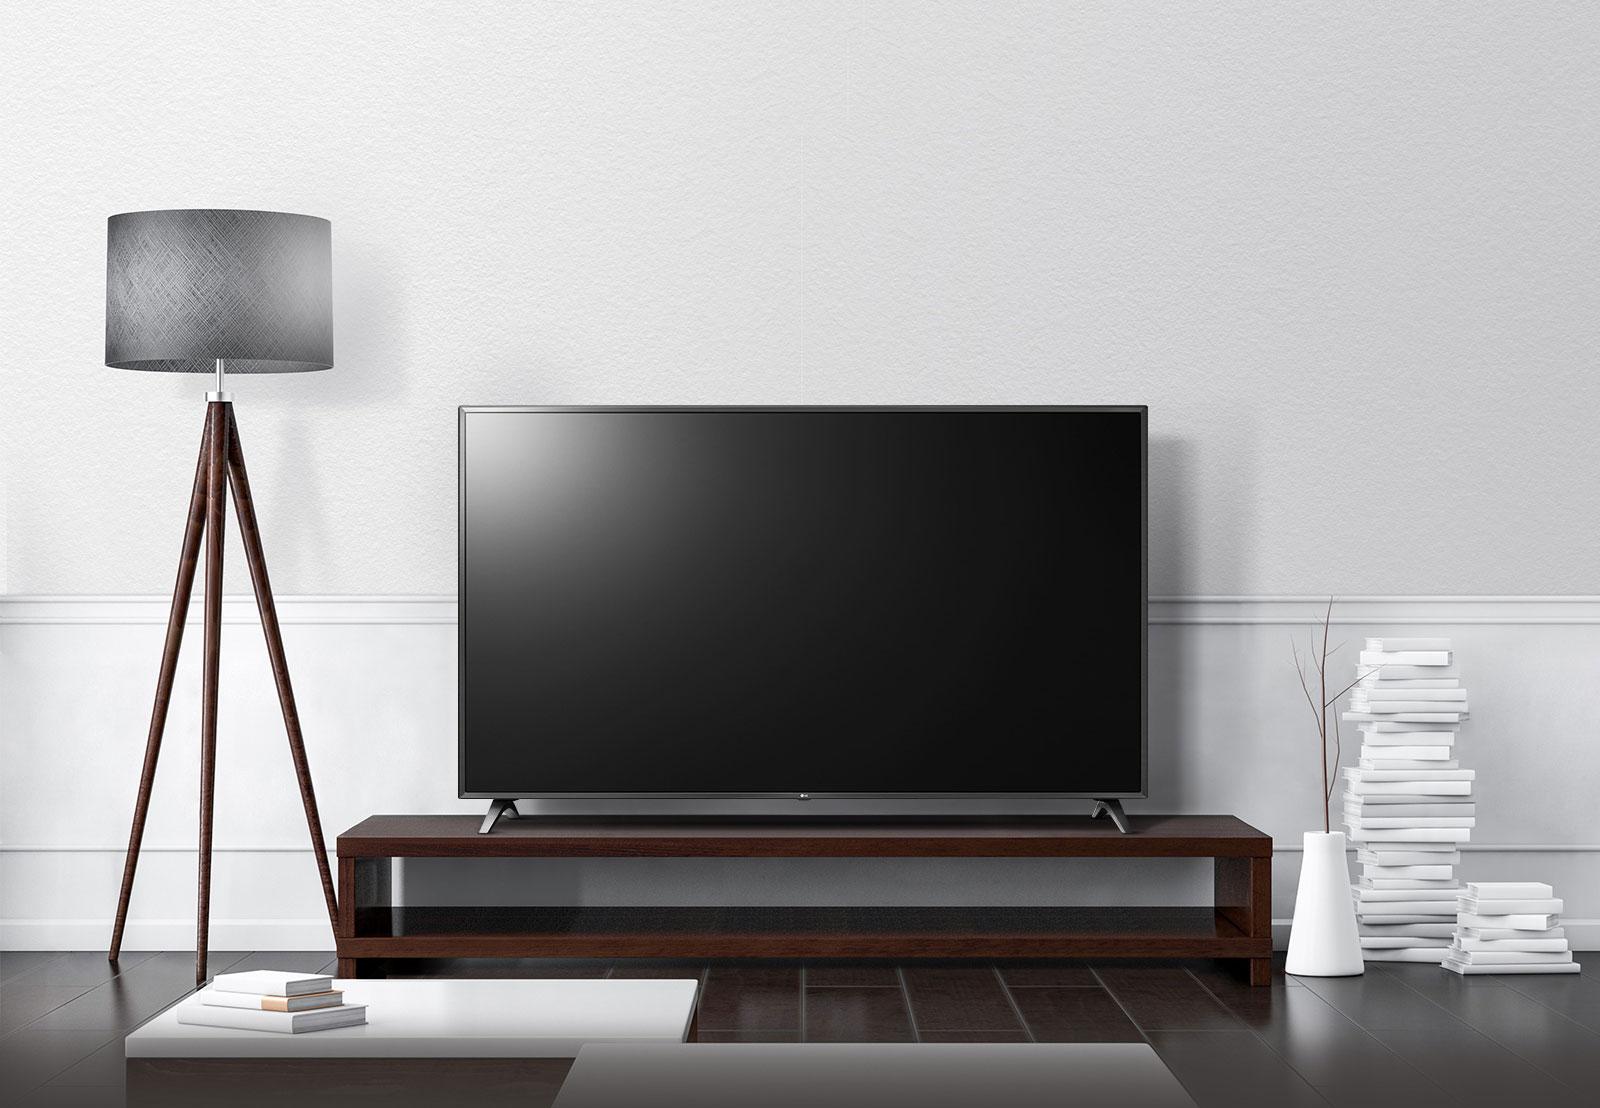 TV-UHD-49-UM73-07-Design-Desktop1